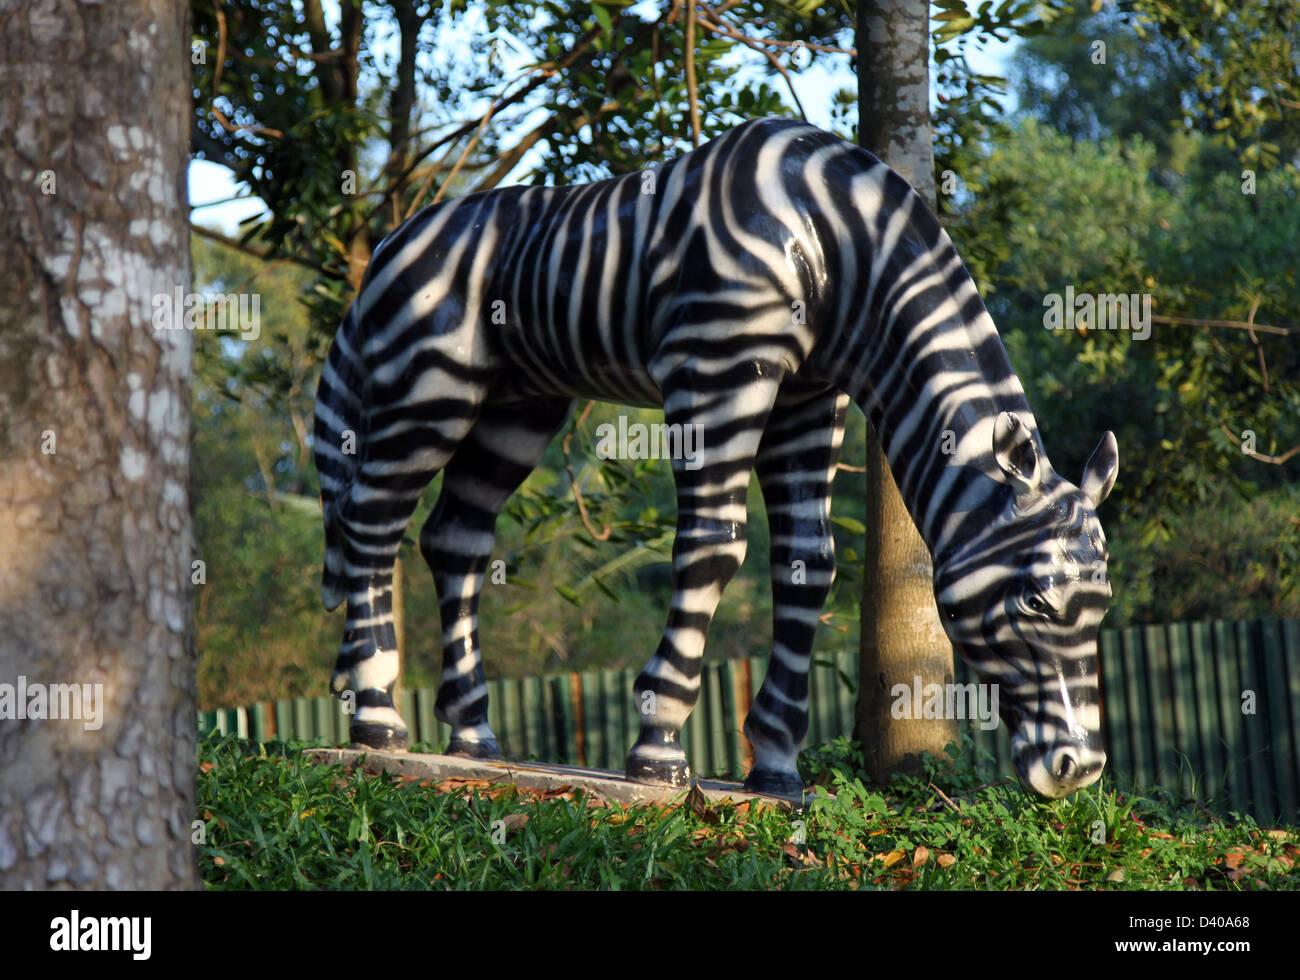 f3fcdac38 Zebra Statue Stock Photos   Zebra Statue Stock Images - Alamy